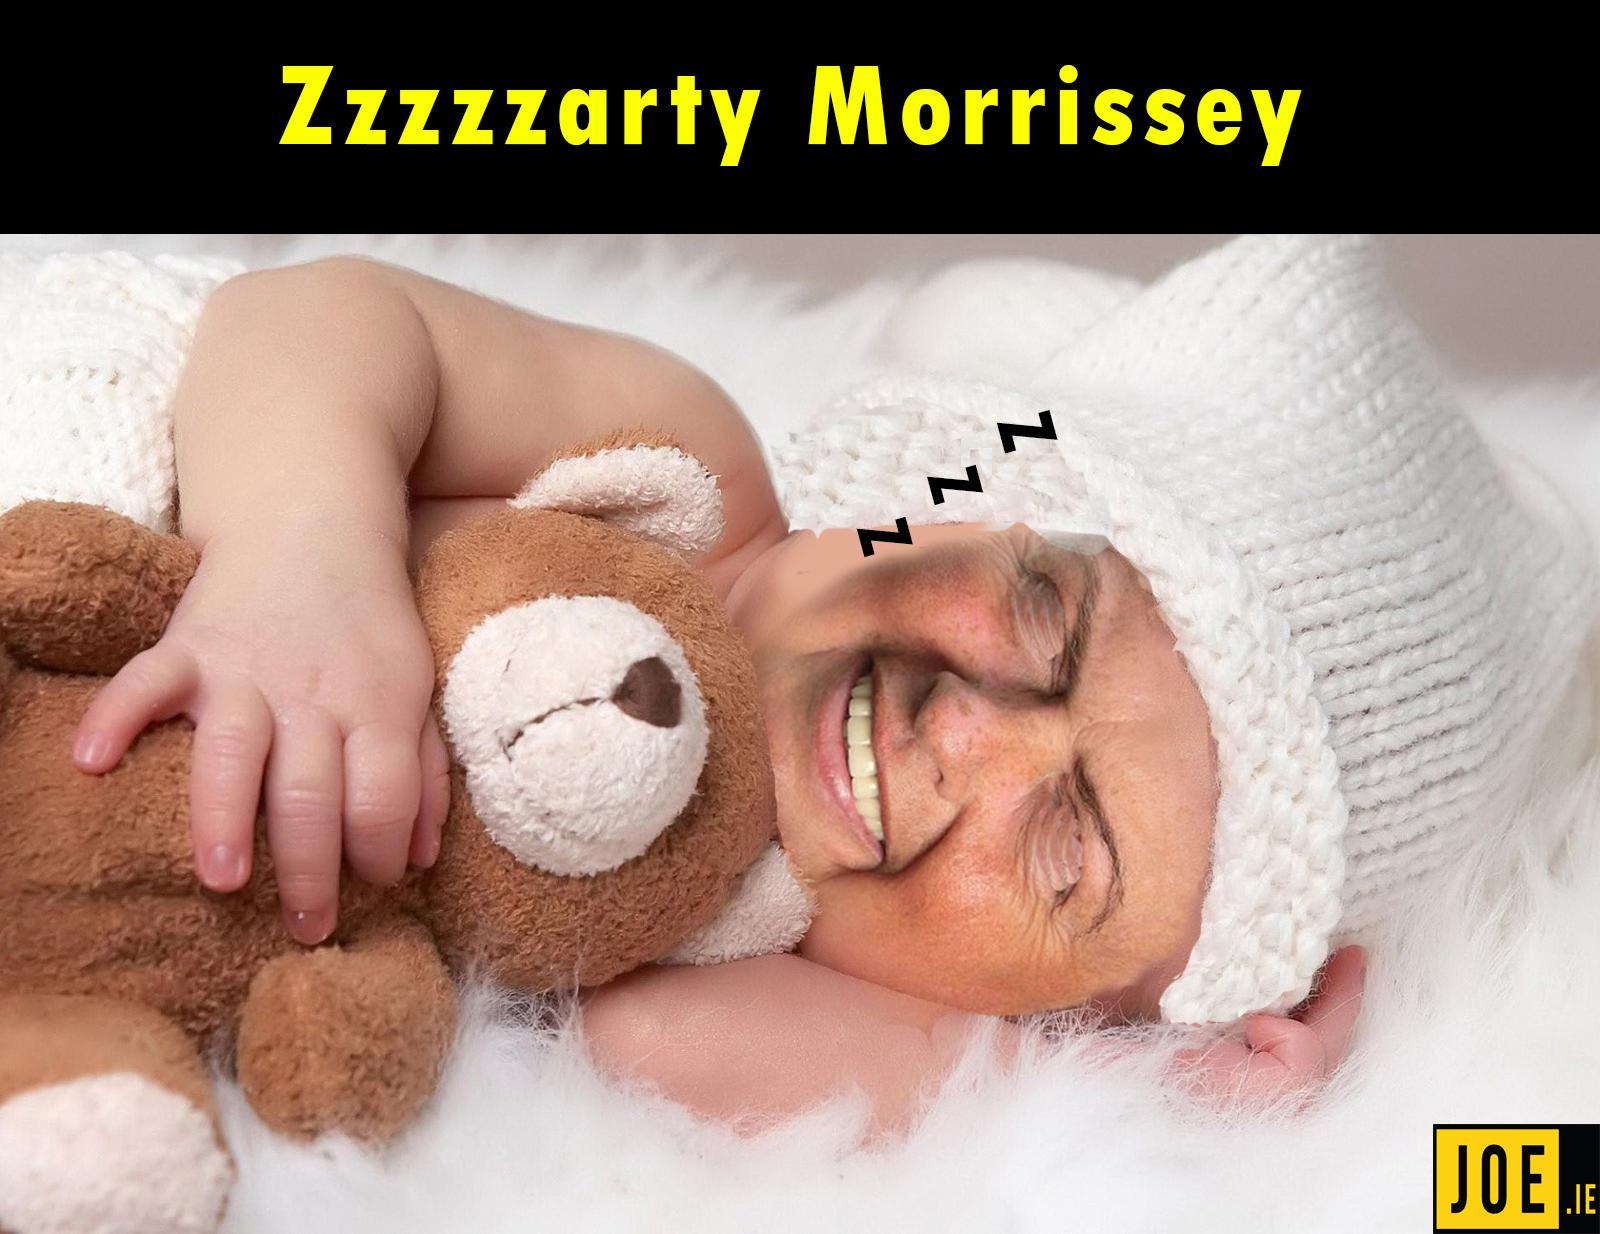 zarty morrissey